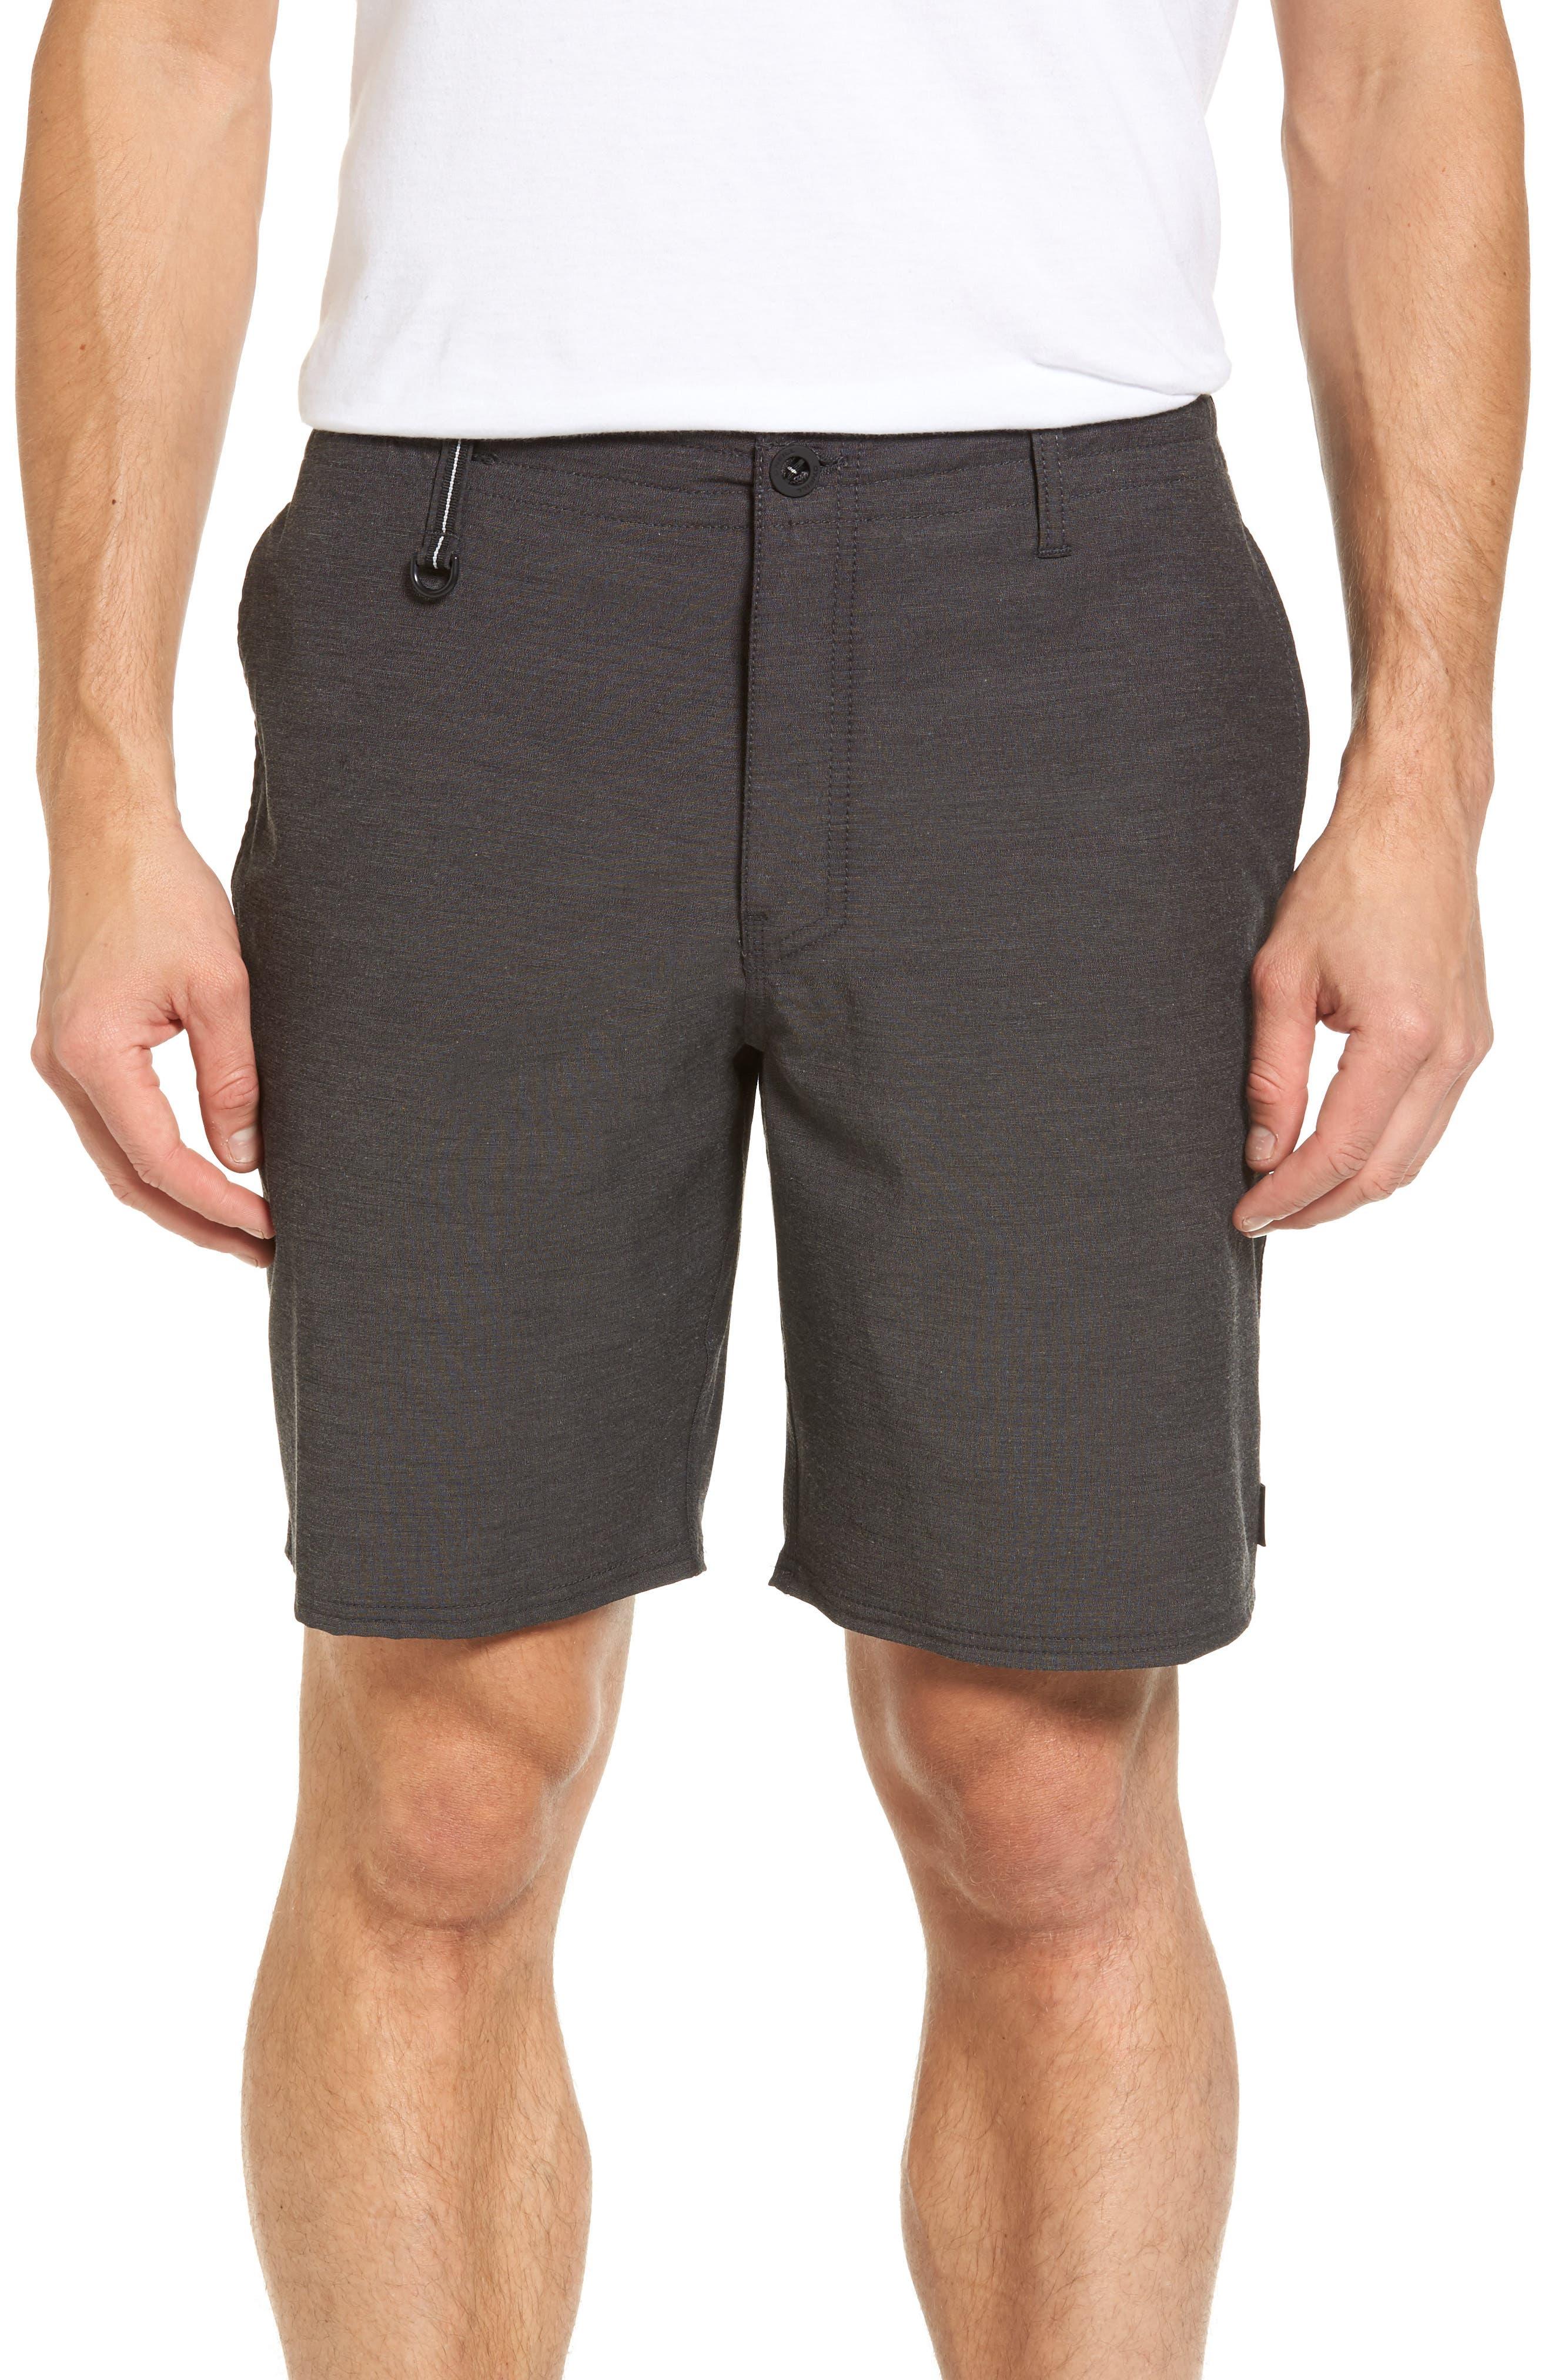 Traveler Recon Hybrid Shorts,                         Main,                         color, Black